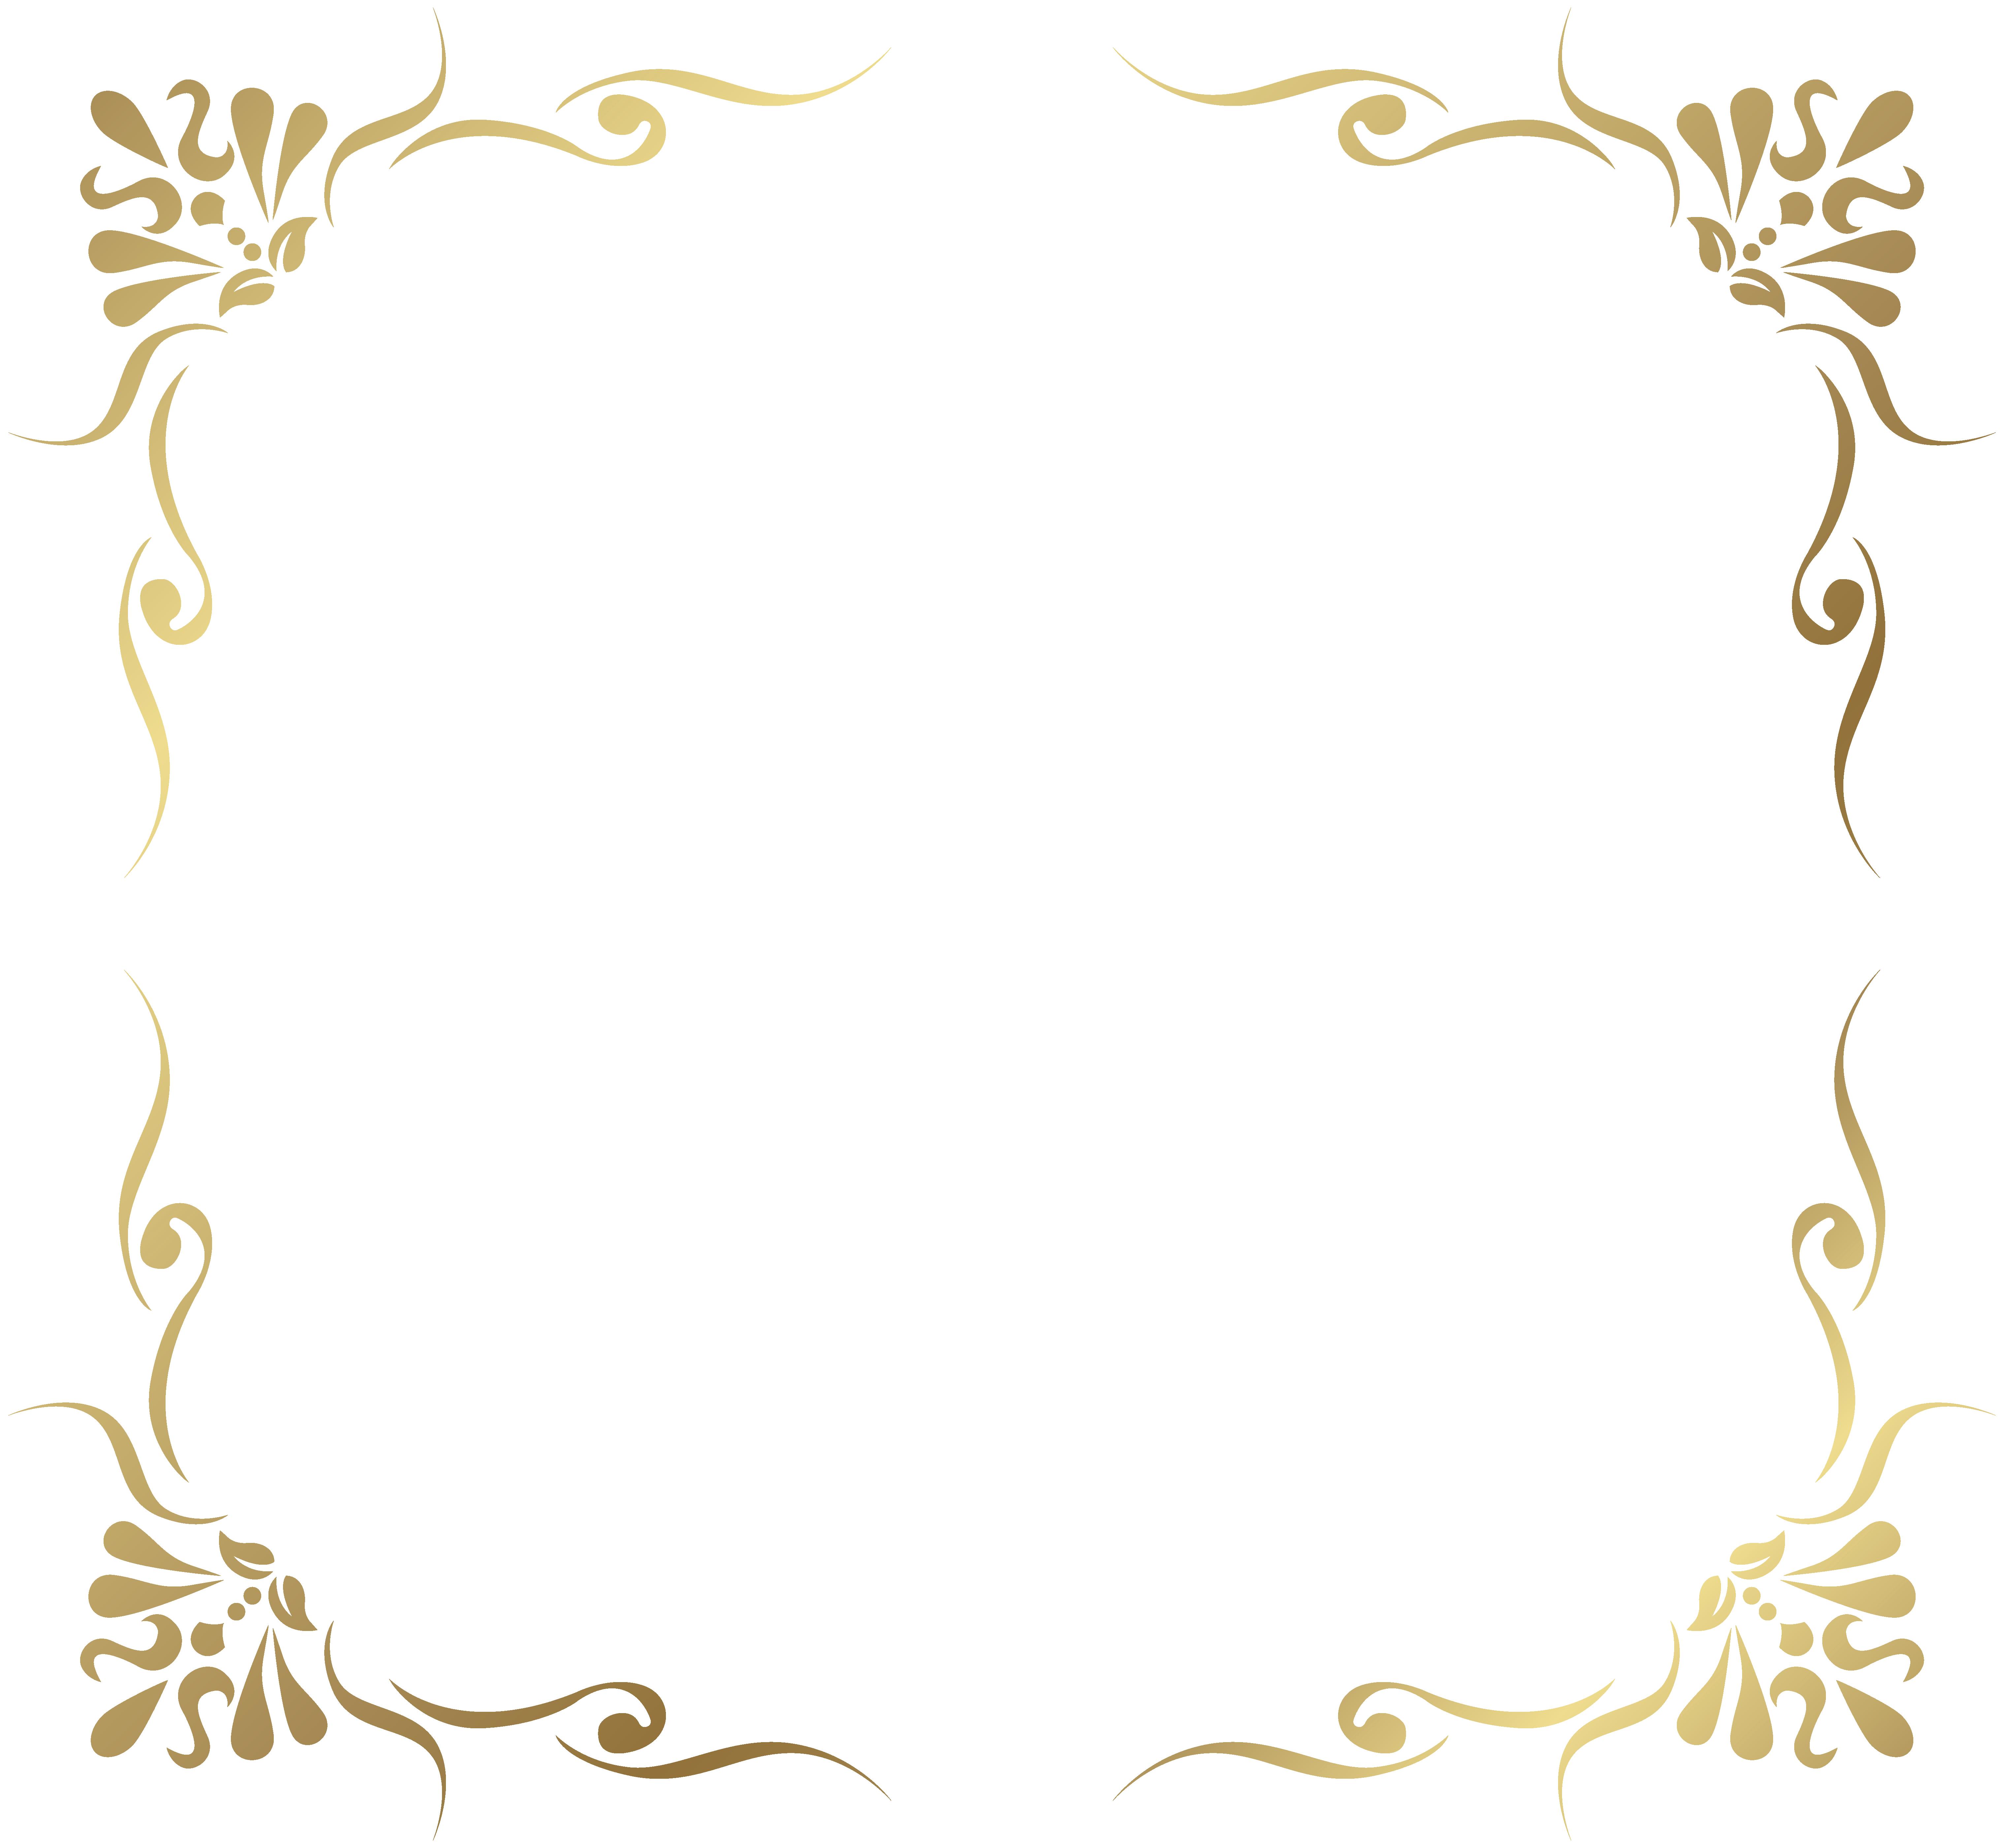 Transparent Decorative Frame Border PNG Picture.